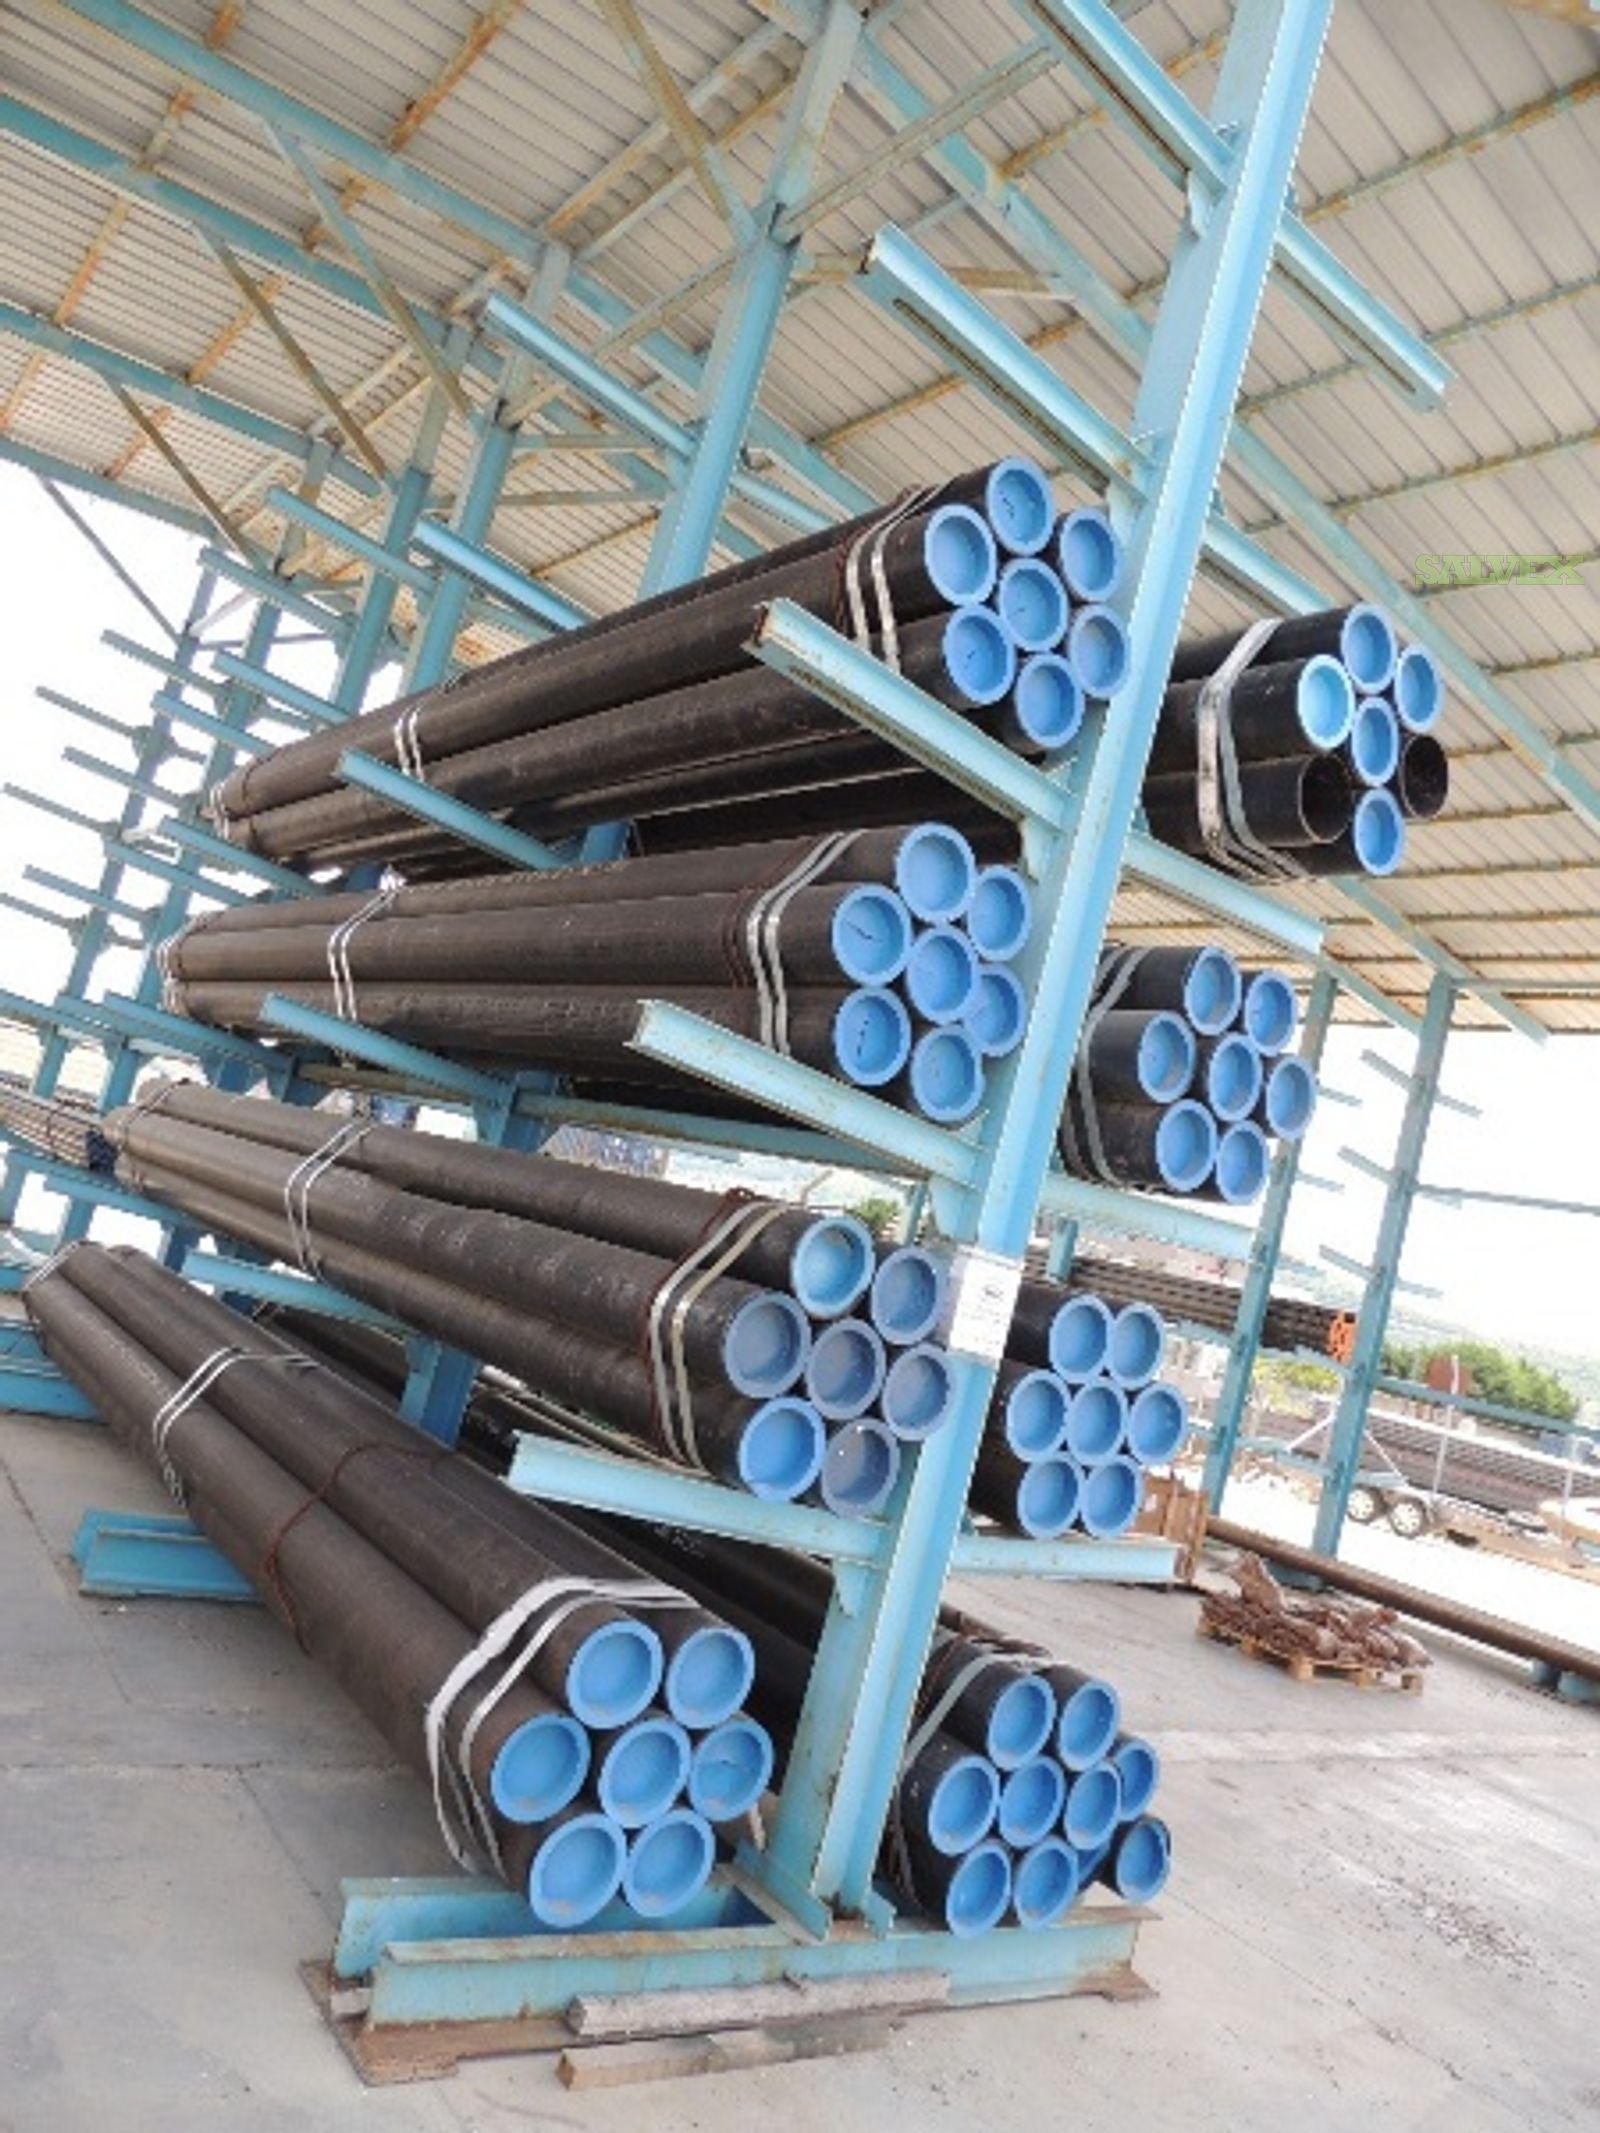 8 26.27# 0.32WT GrB Surplus Line Pipe (990 Feet / 12 Metric Tons)